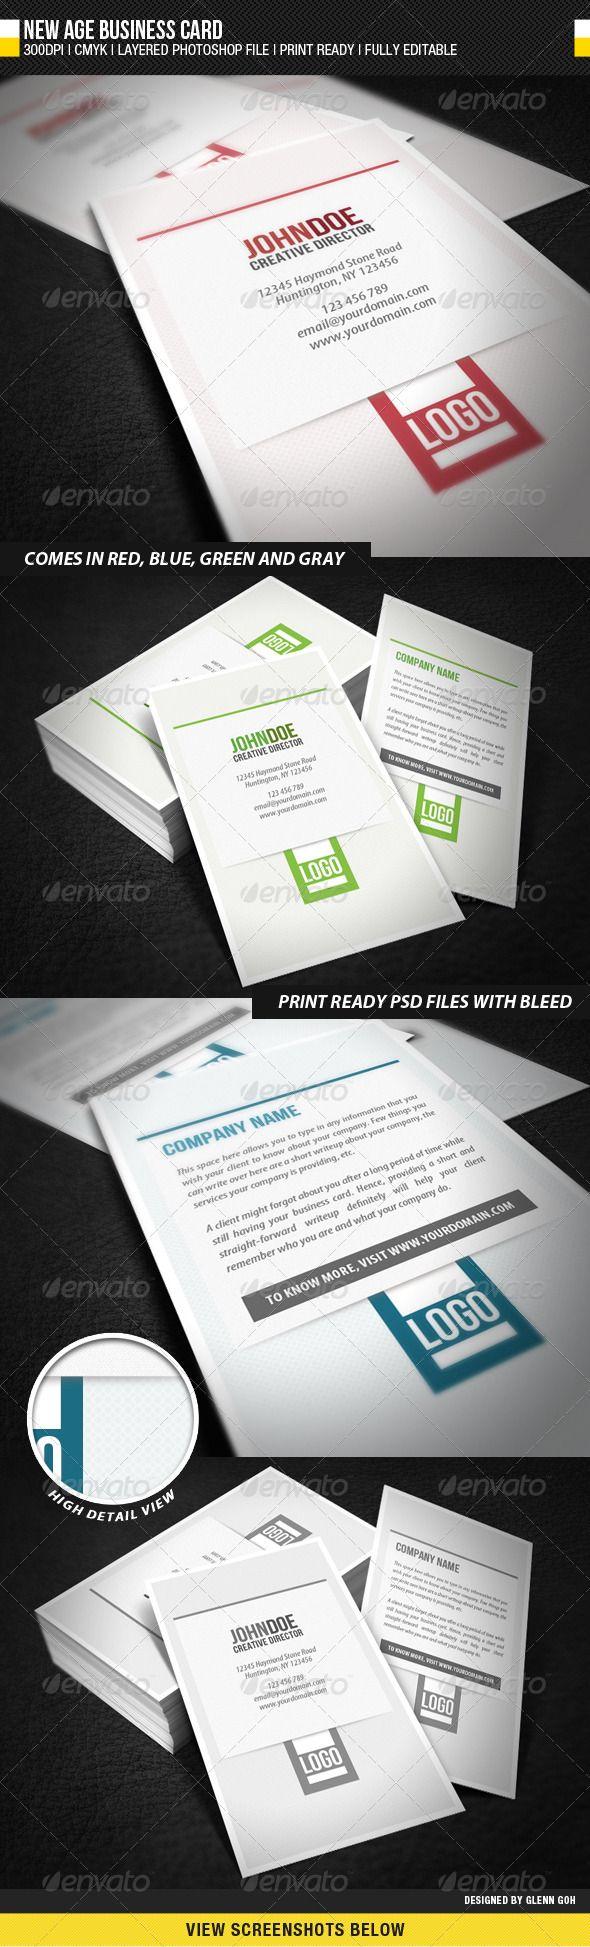 104 best print templates images on pinterest print templates 104 best print templates images on pinterest print templates font logo and flyer template magicingreecefo Images